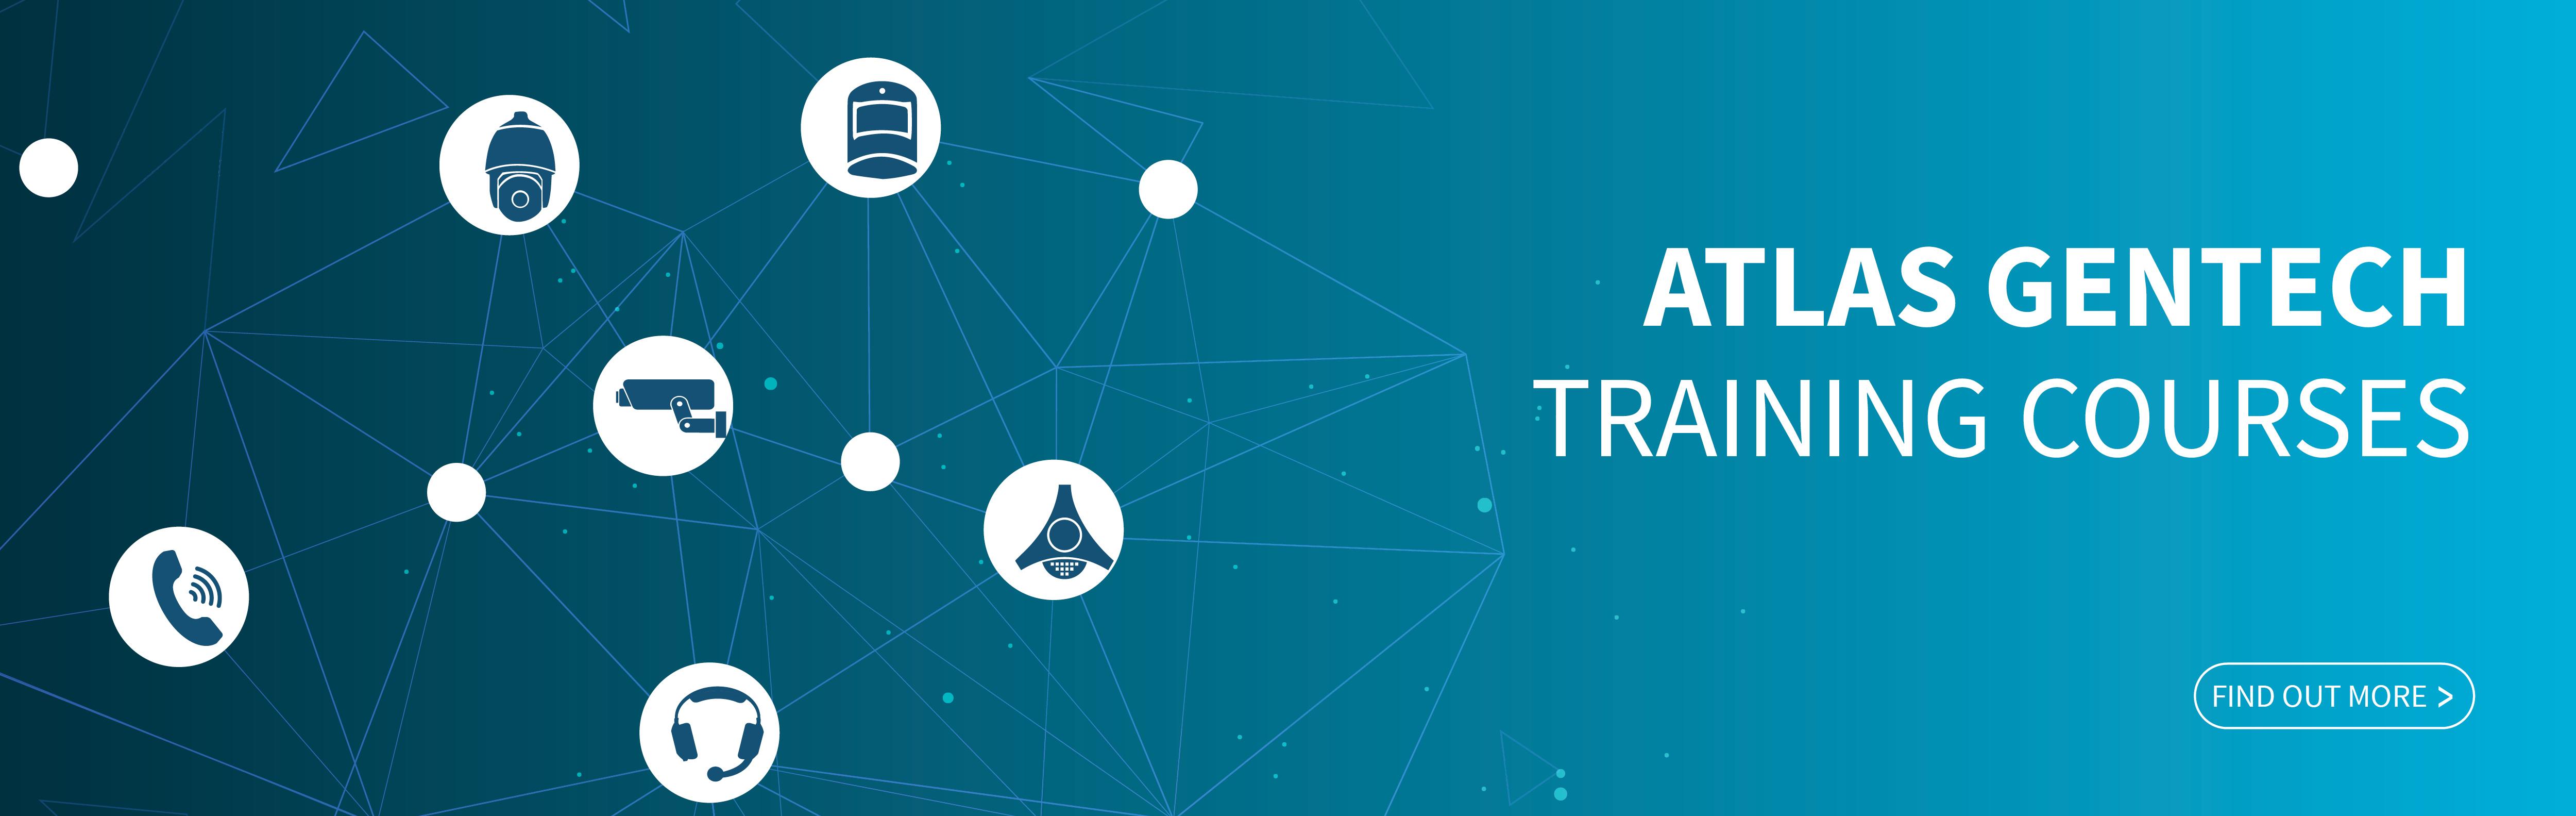 Atlas Gentech Training